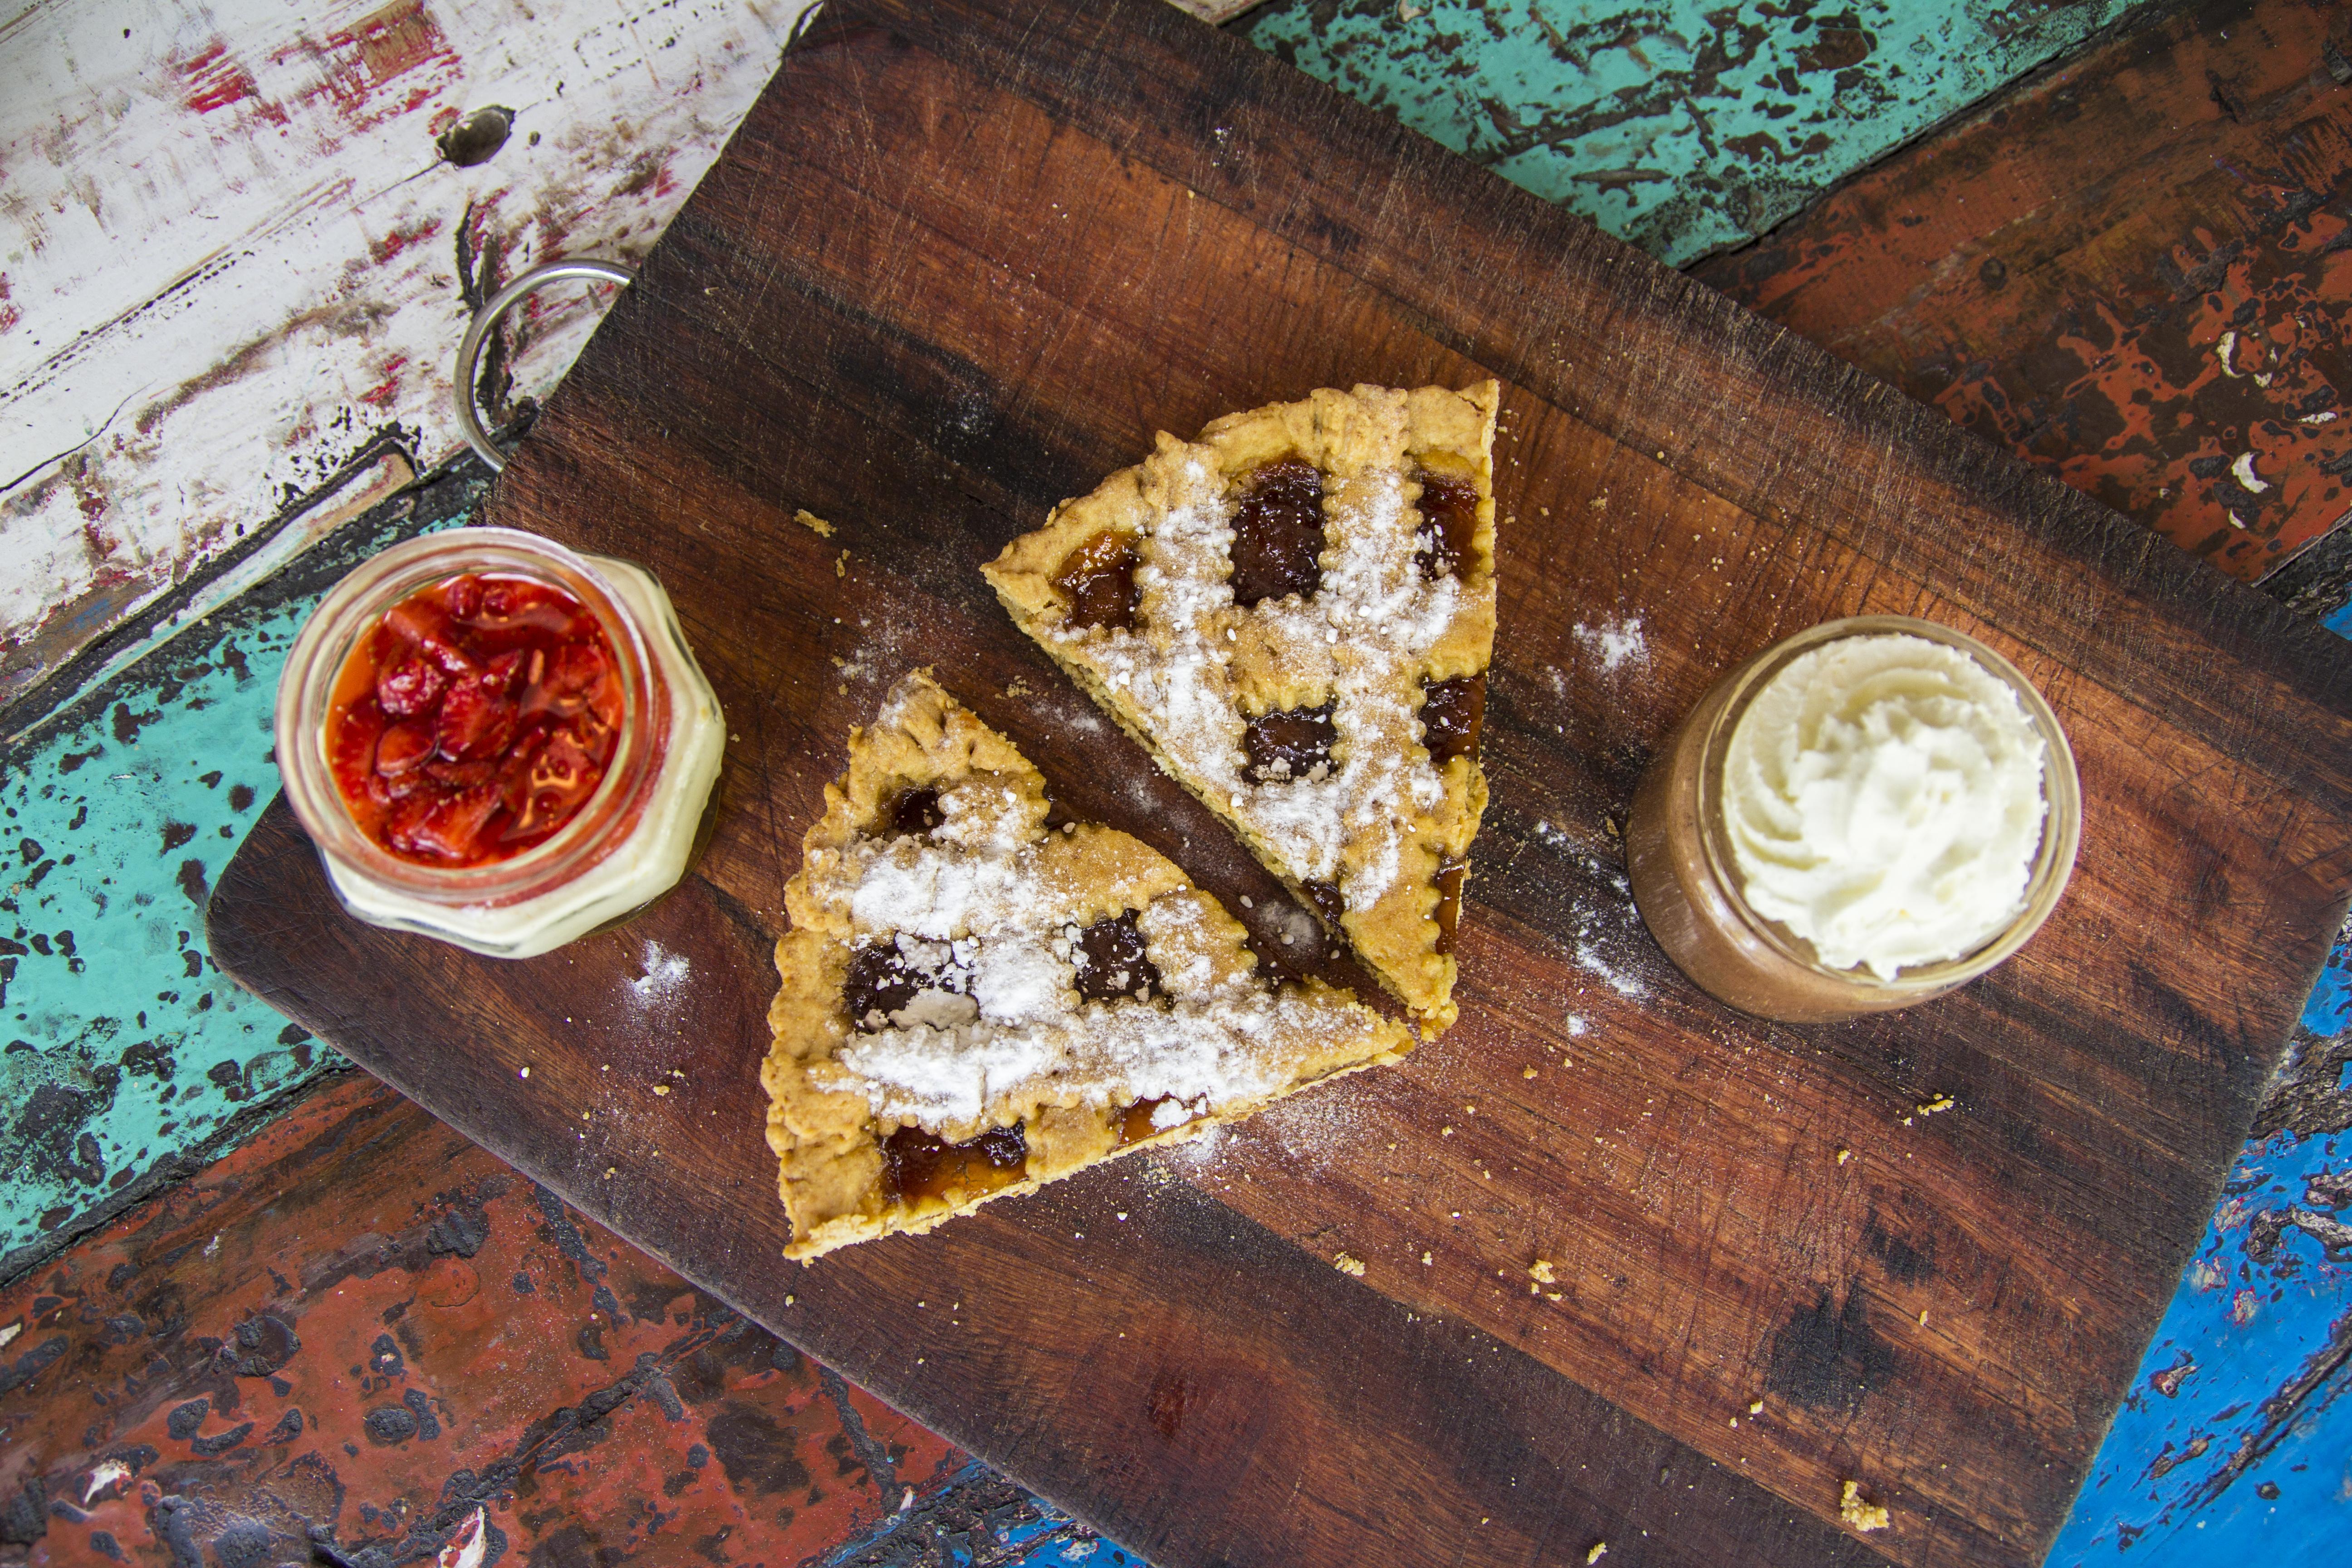 Desert Restaurant Bali La Casetta